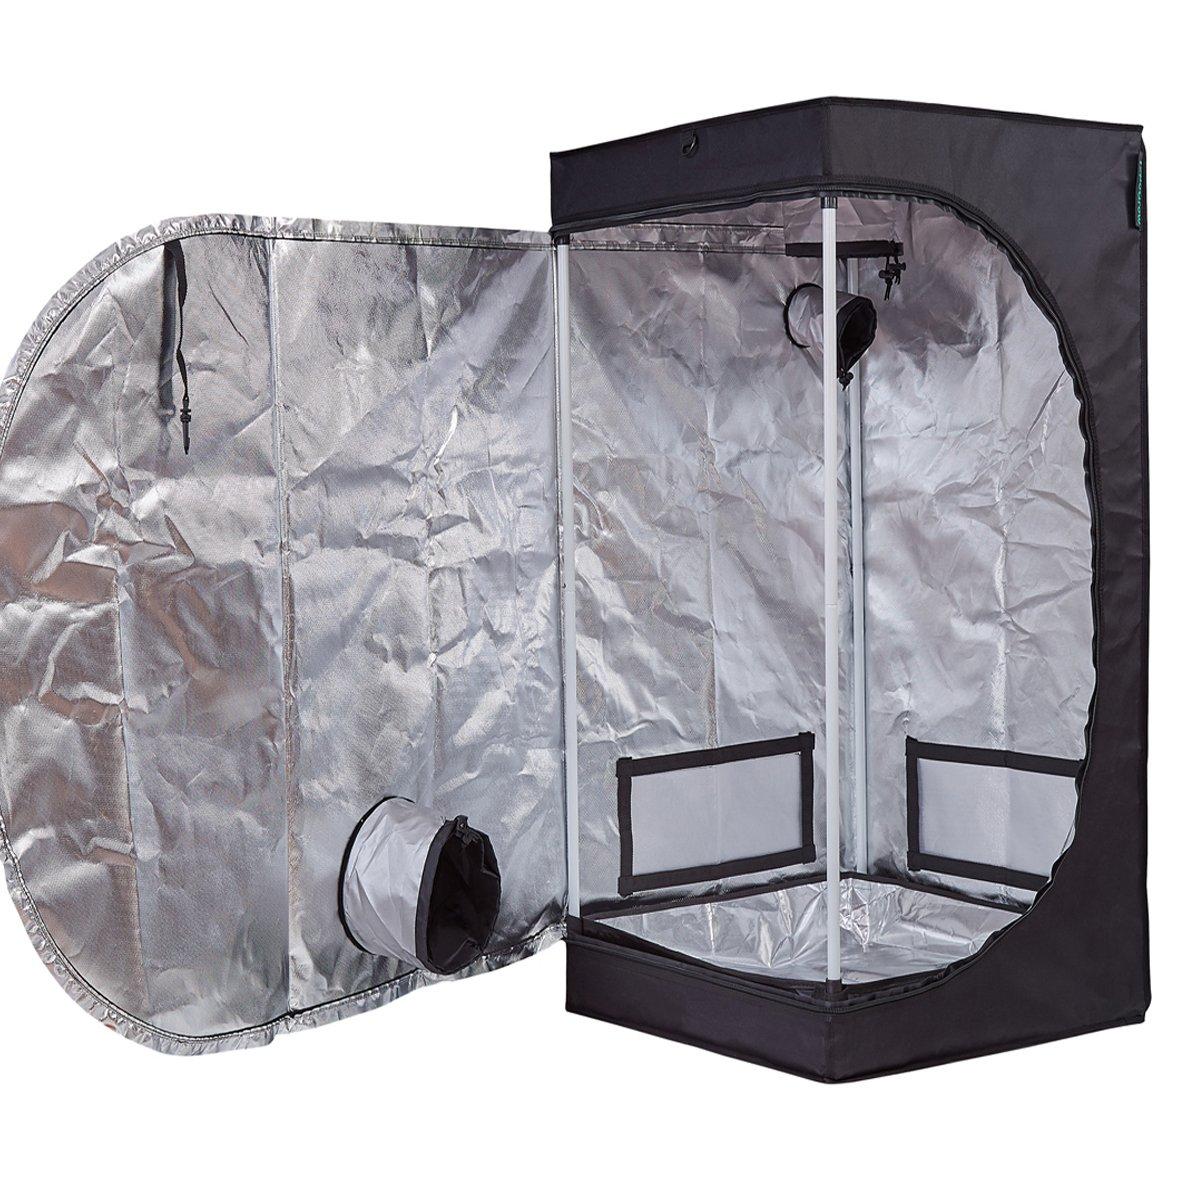 TopoGrow Multiple Sized Indoor Grow Tent 20 X20 X48 Hydroponic Plant Growing W Plastic Corners, 20 x20 x48